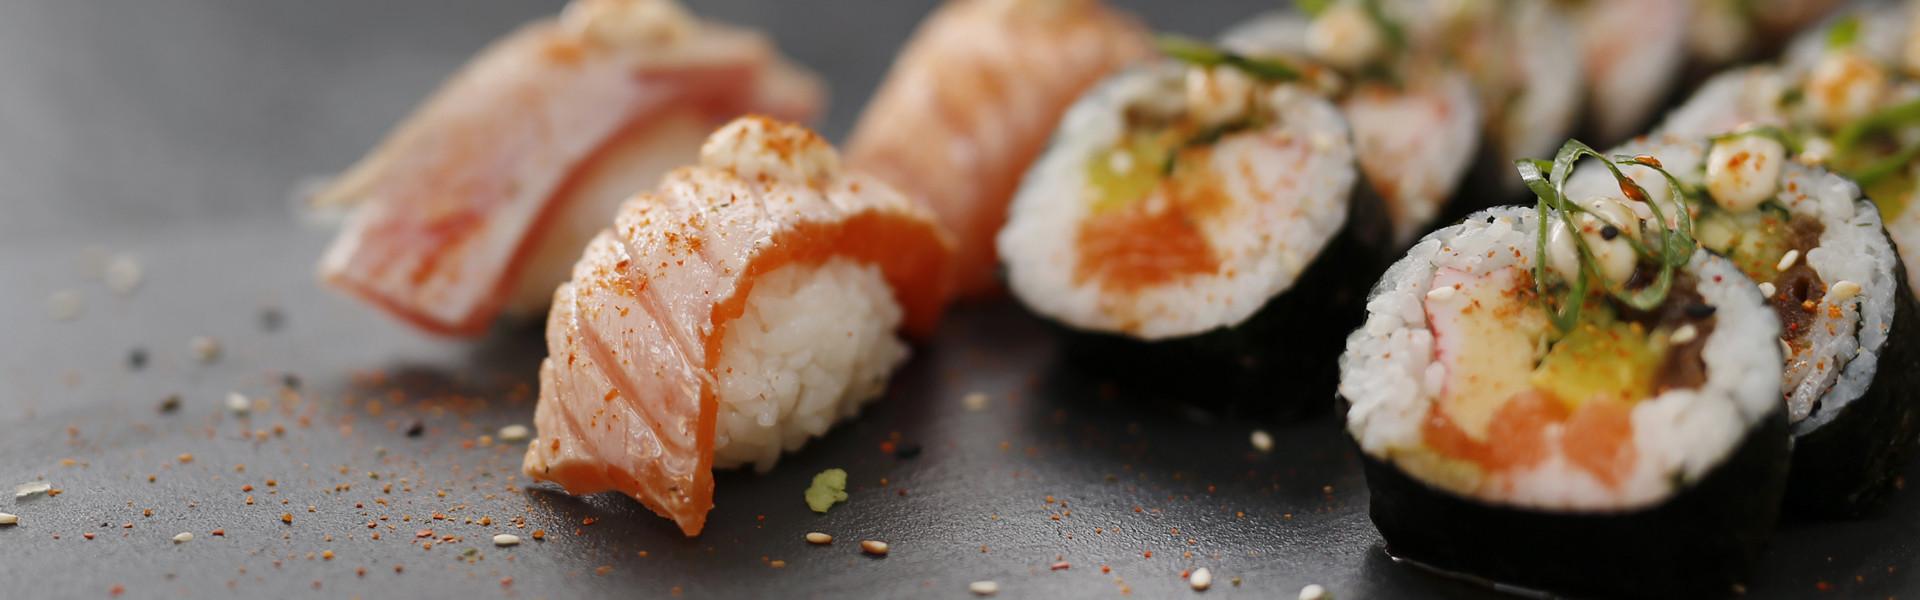 Sushi Shop - Alexis Nihon